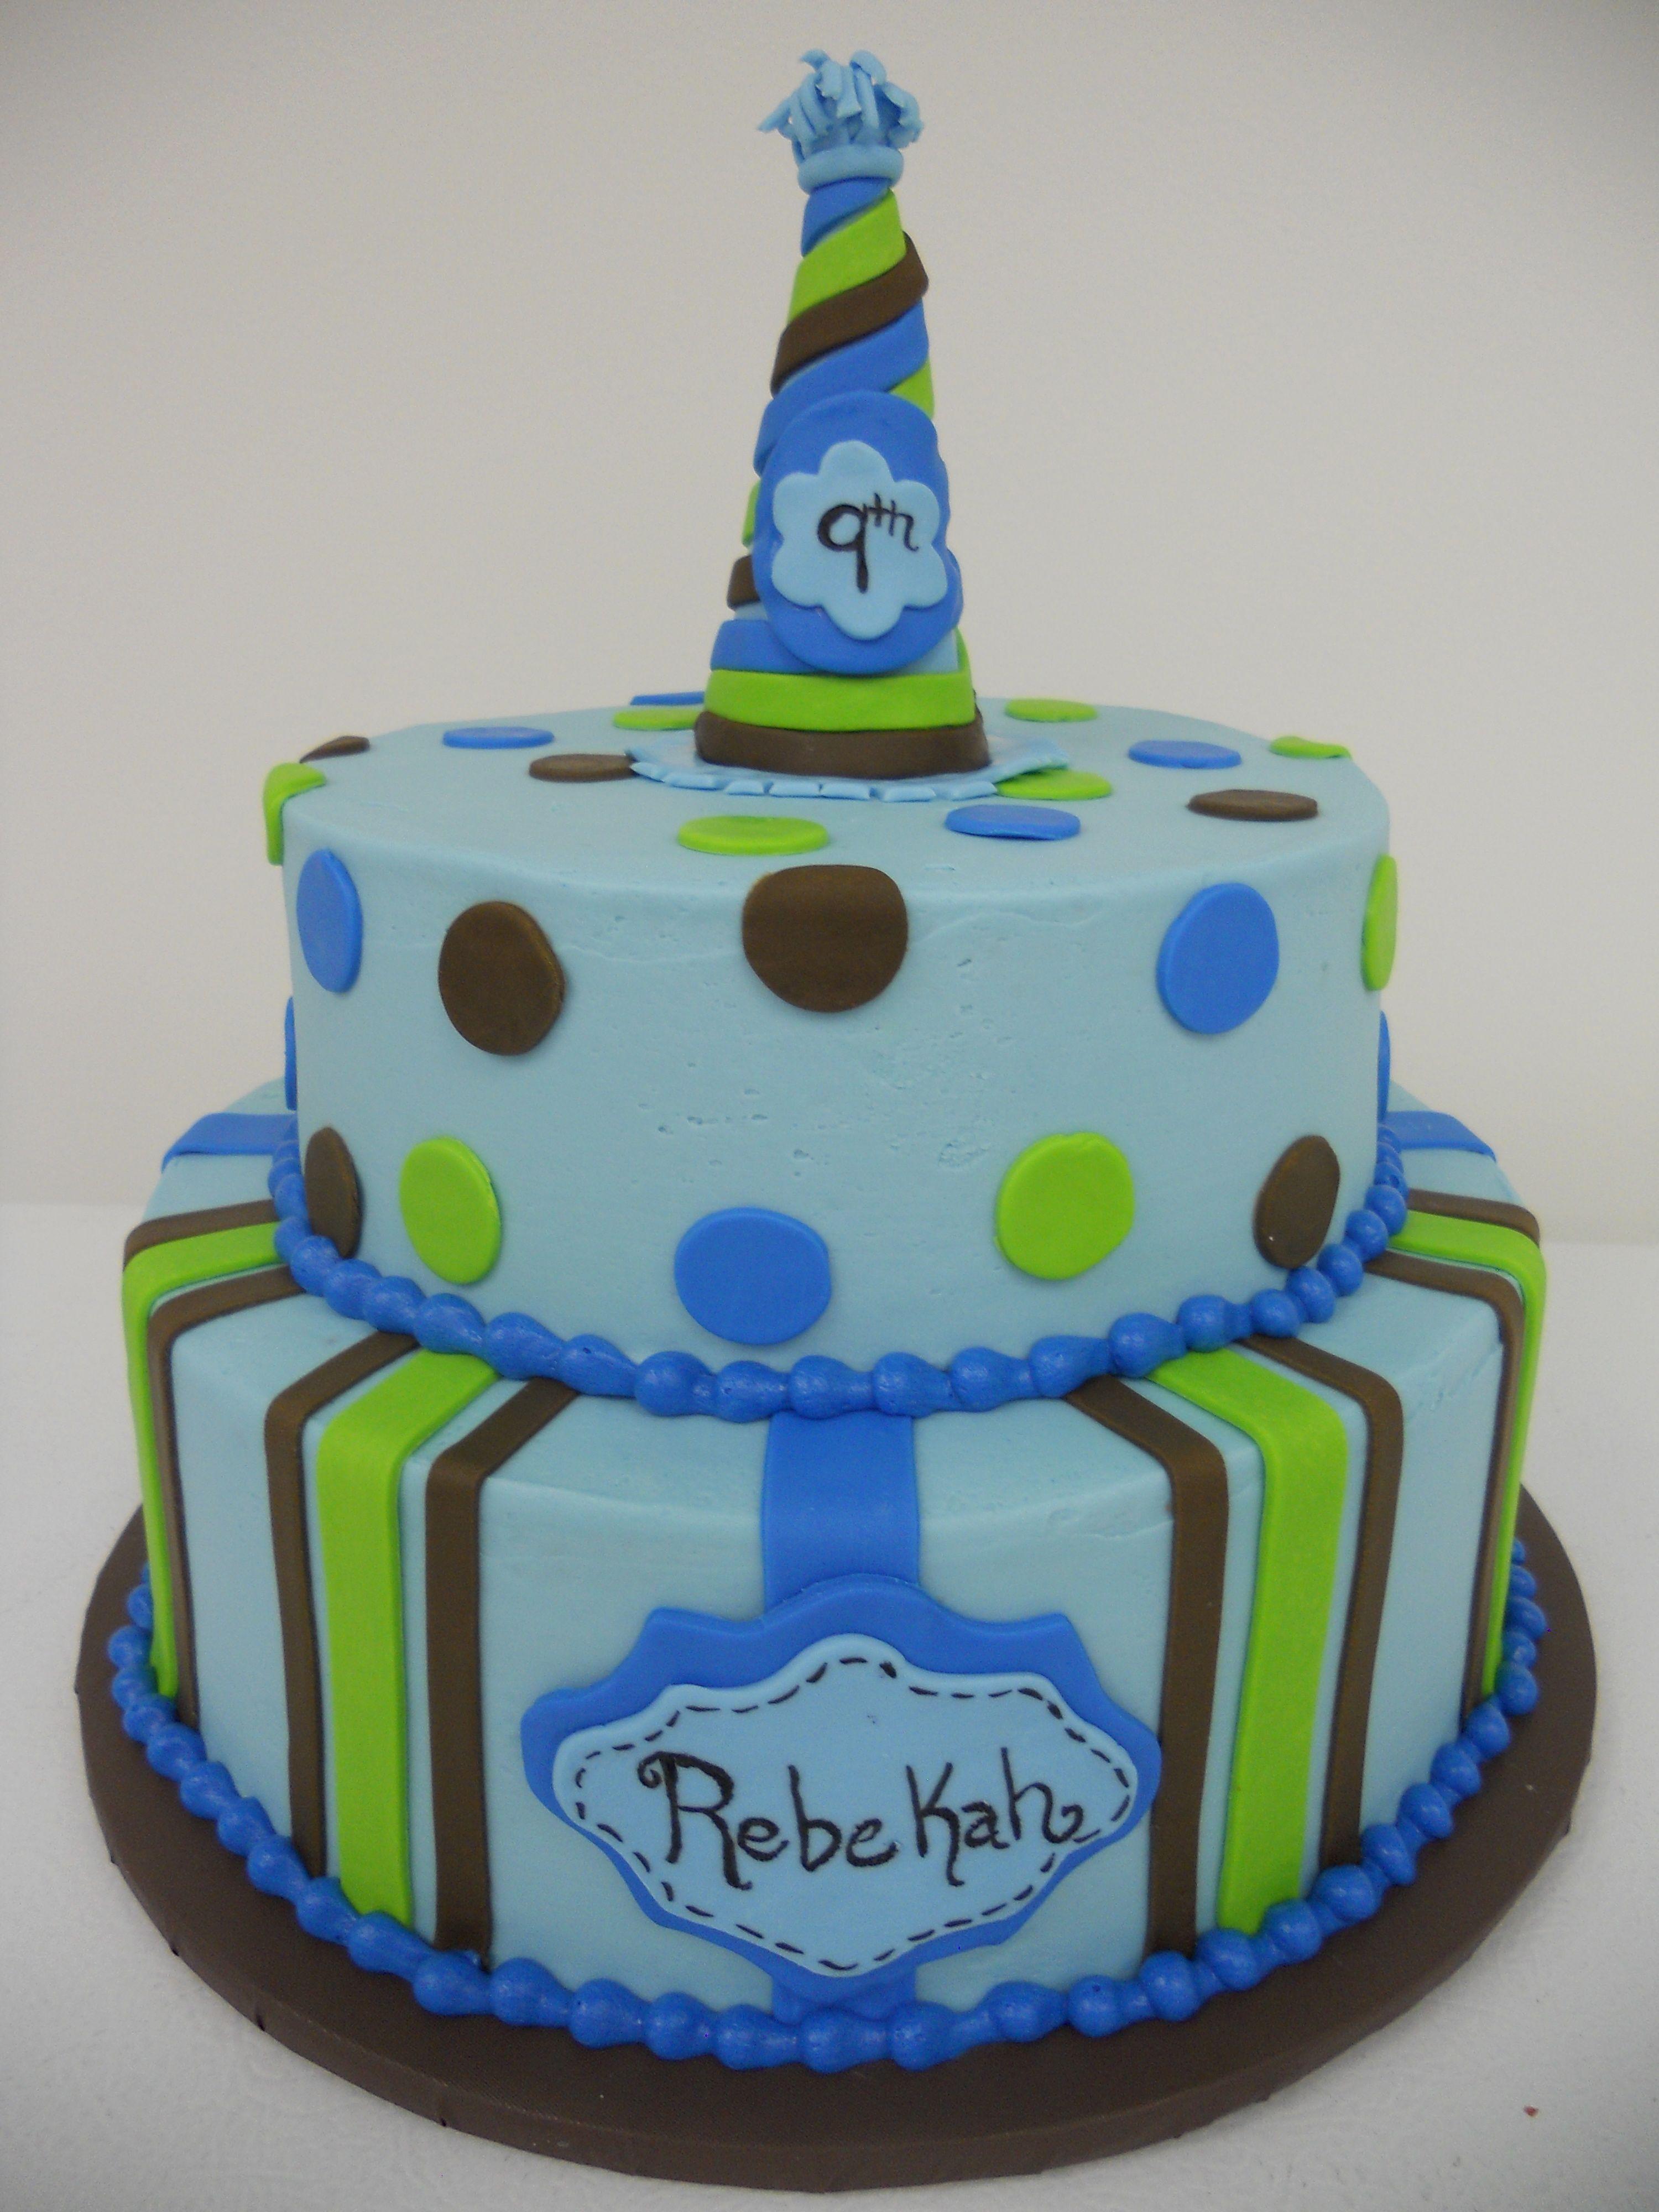 Tremendous Blue Green And Brown Birthday Cake Birthdaycake Personalised Birthday Cards Sponlily Jamesorg